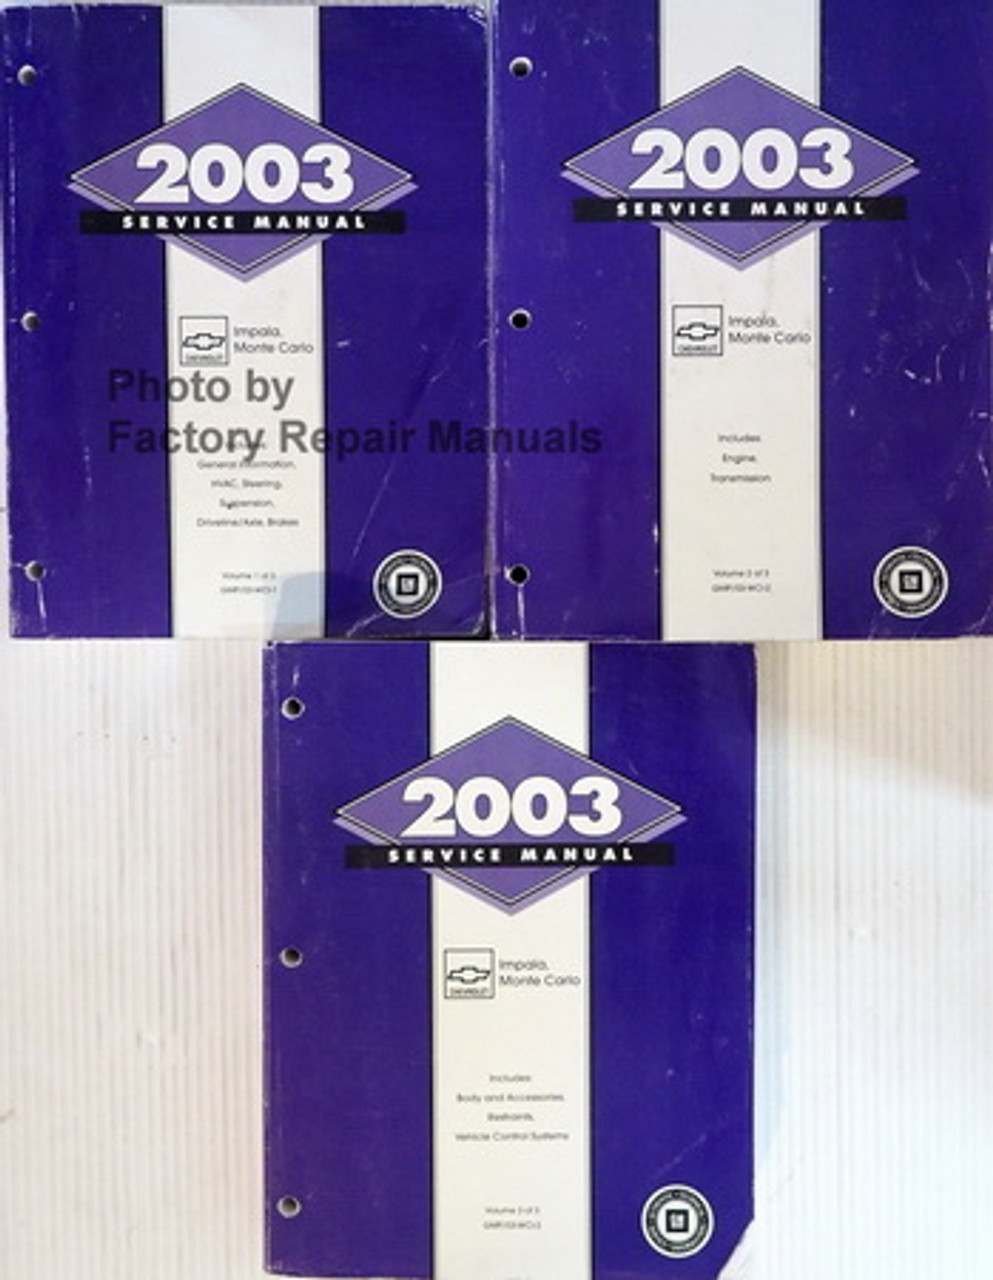 2003 Chevy Impala  Monte Carlo Factory Service Manual Set - Original Shop Repair